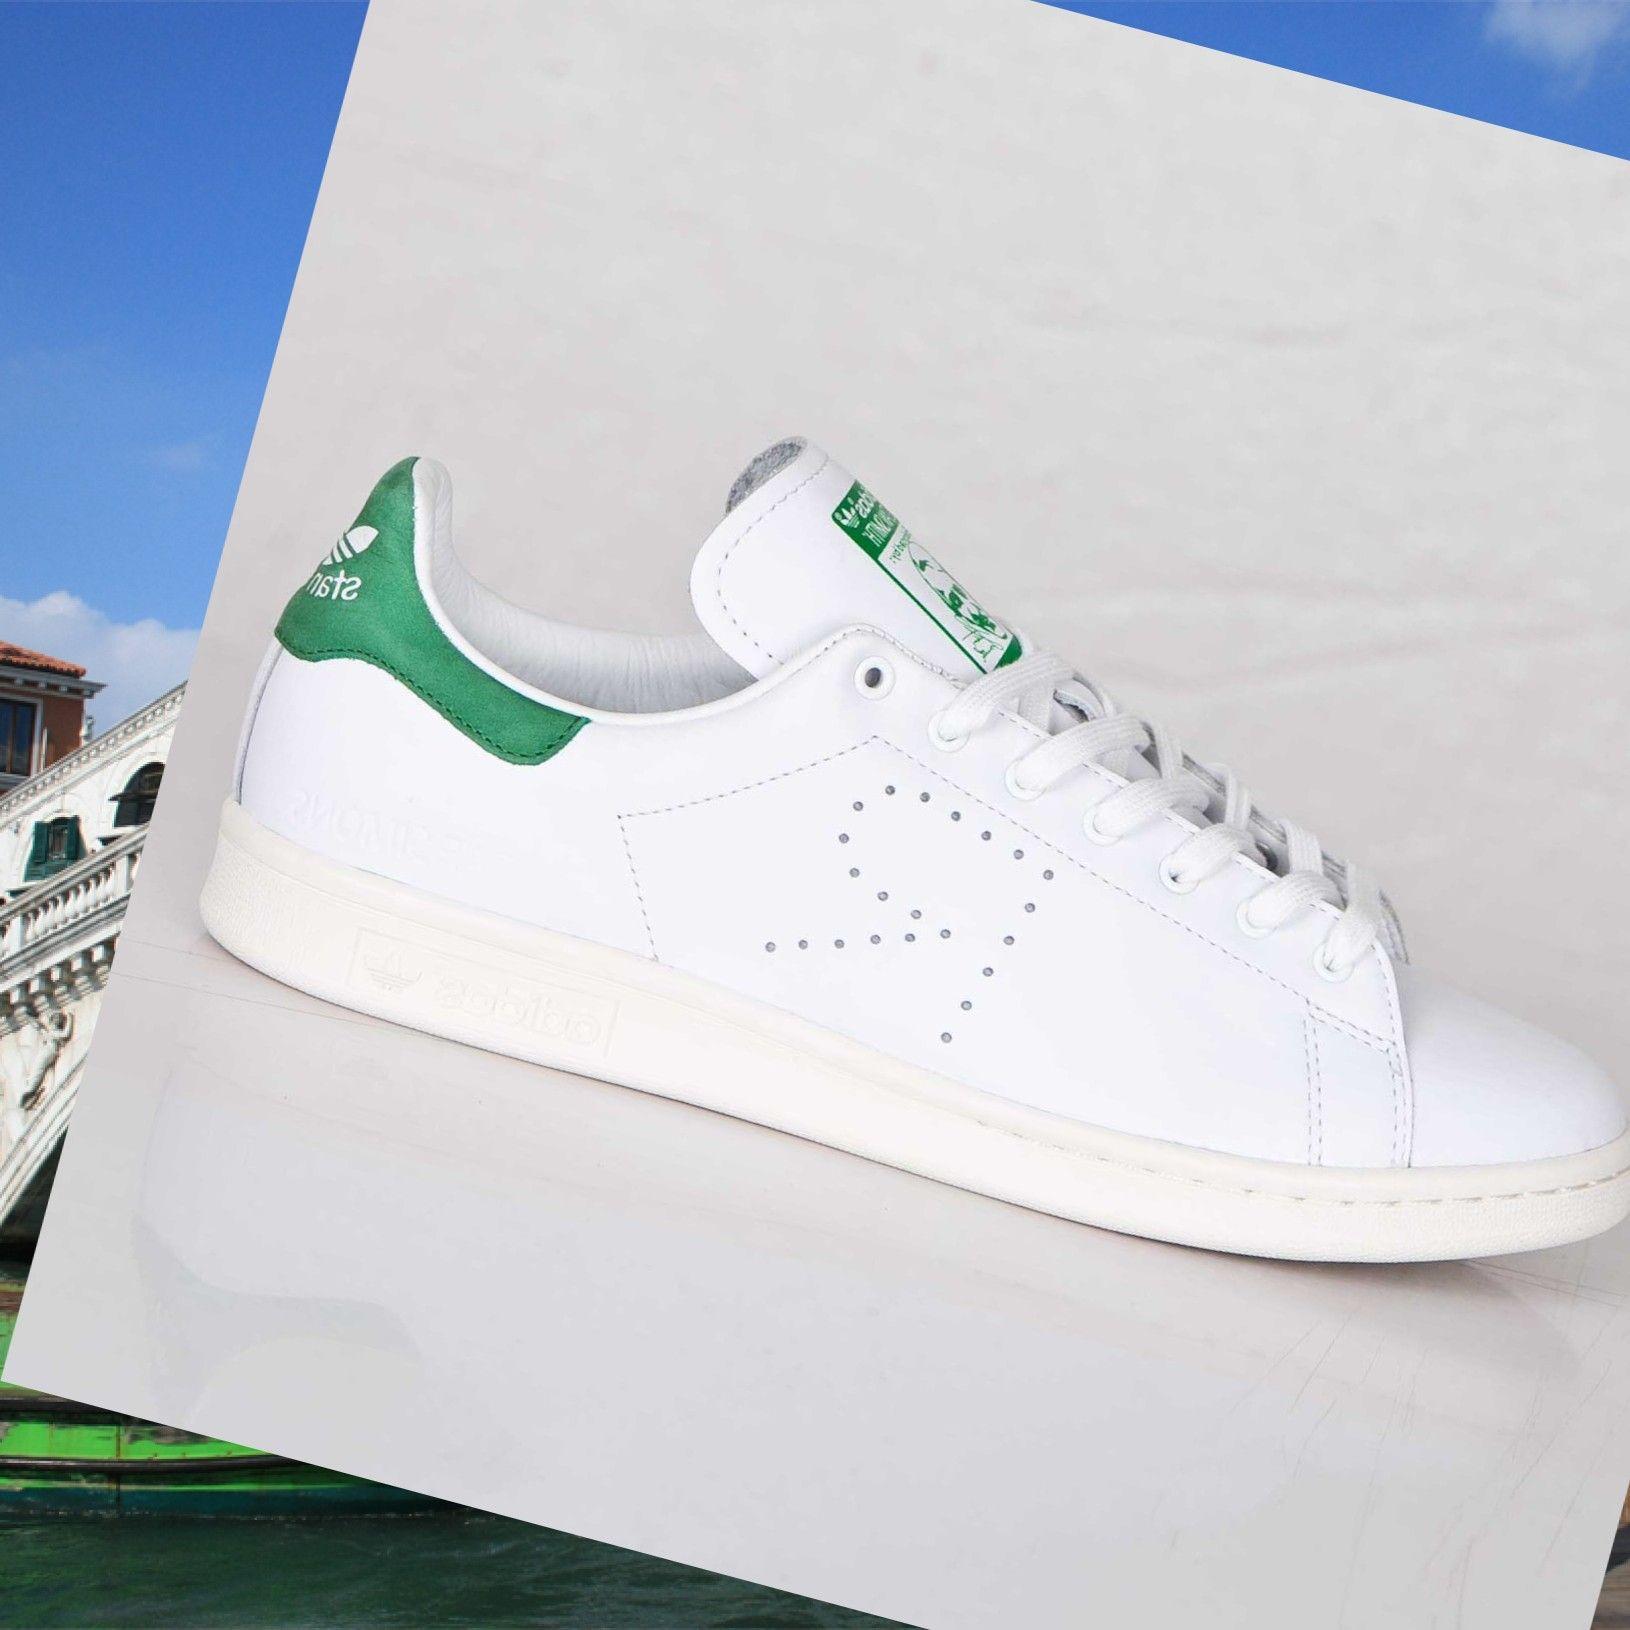 Uomini, abbigliamento Raf Simons x Adidas Stan Smith Ftw Bianco/Verde